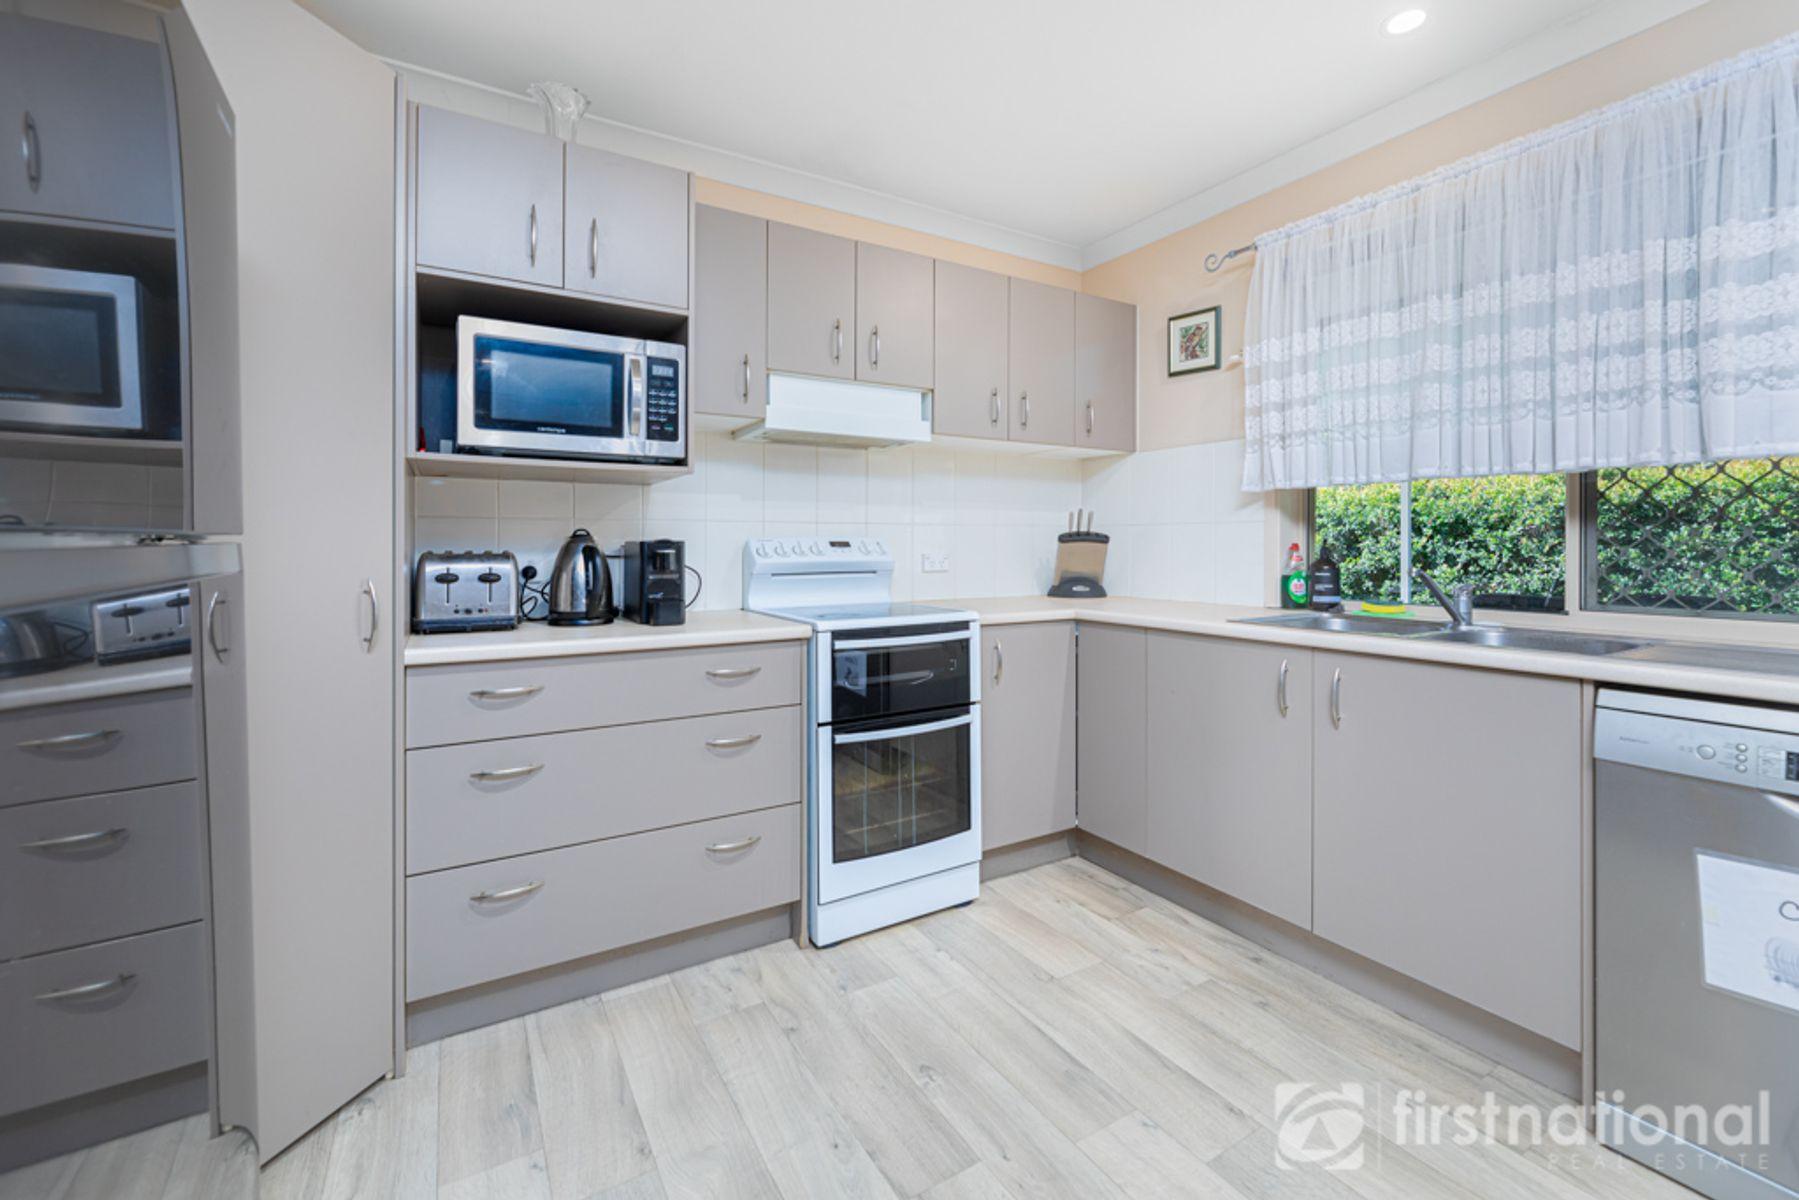 16 Winston Court, Landsborough, QLD 4550